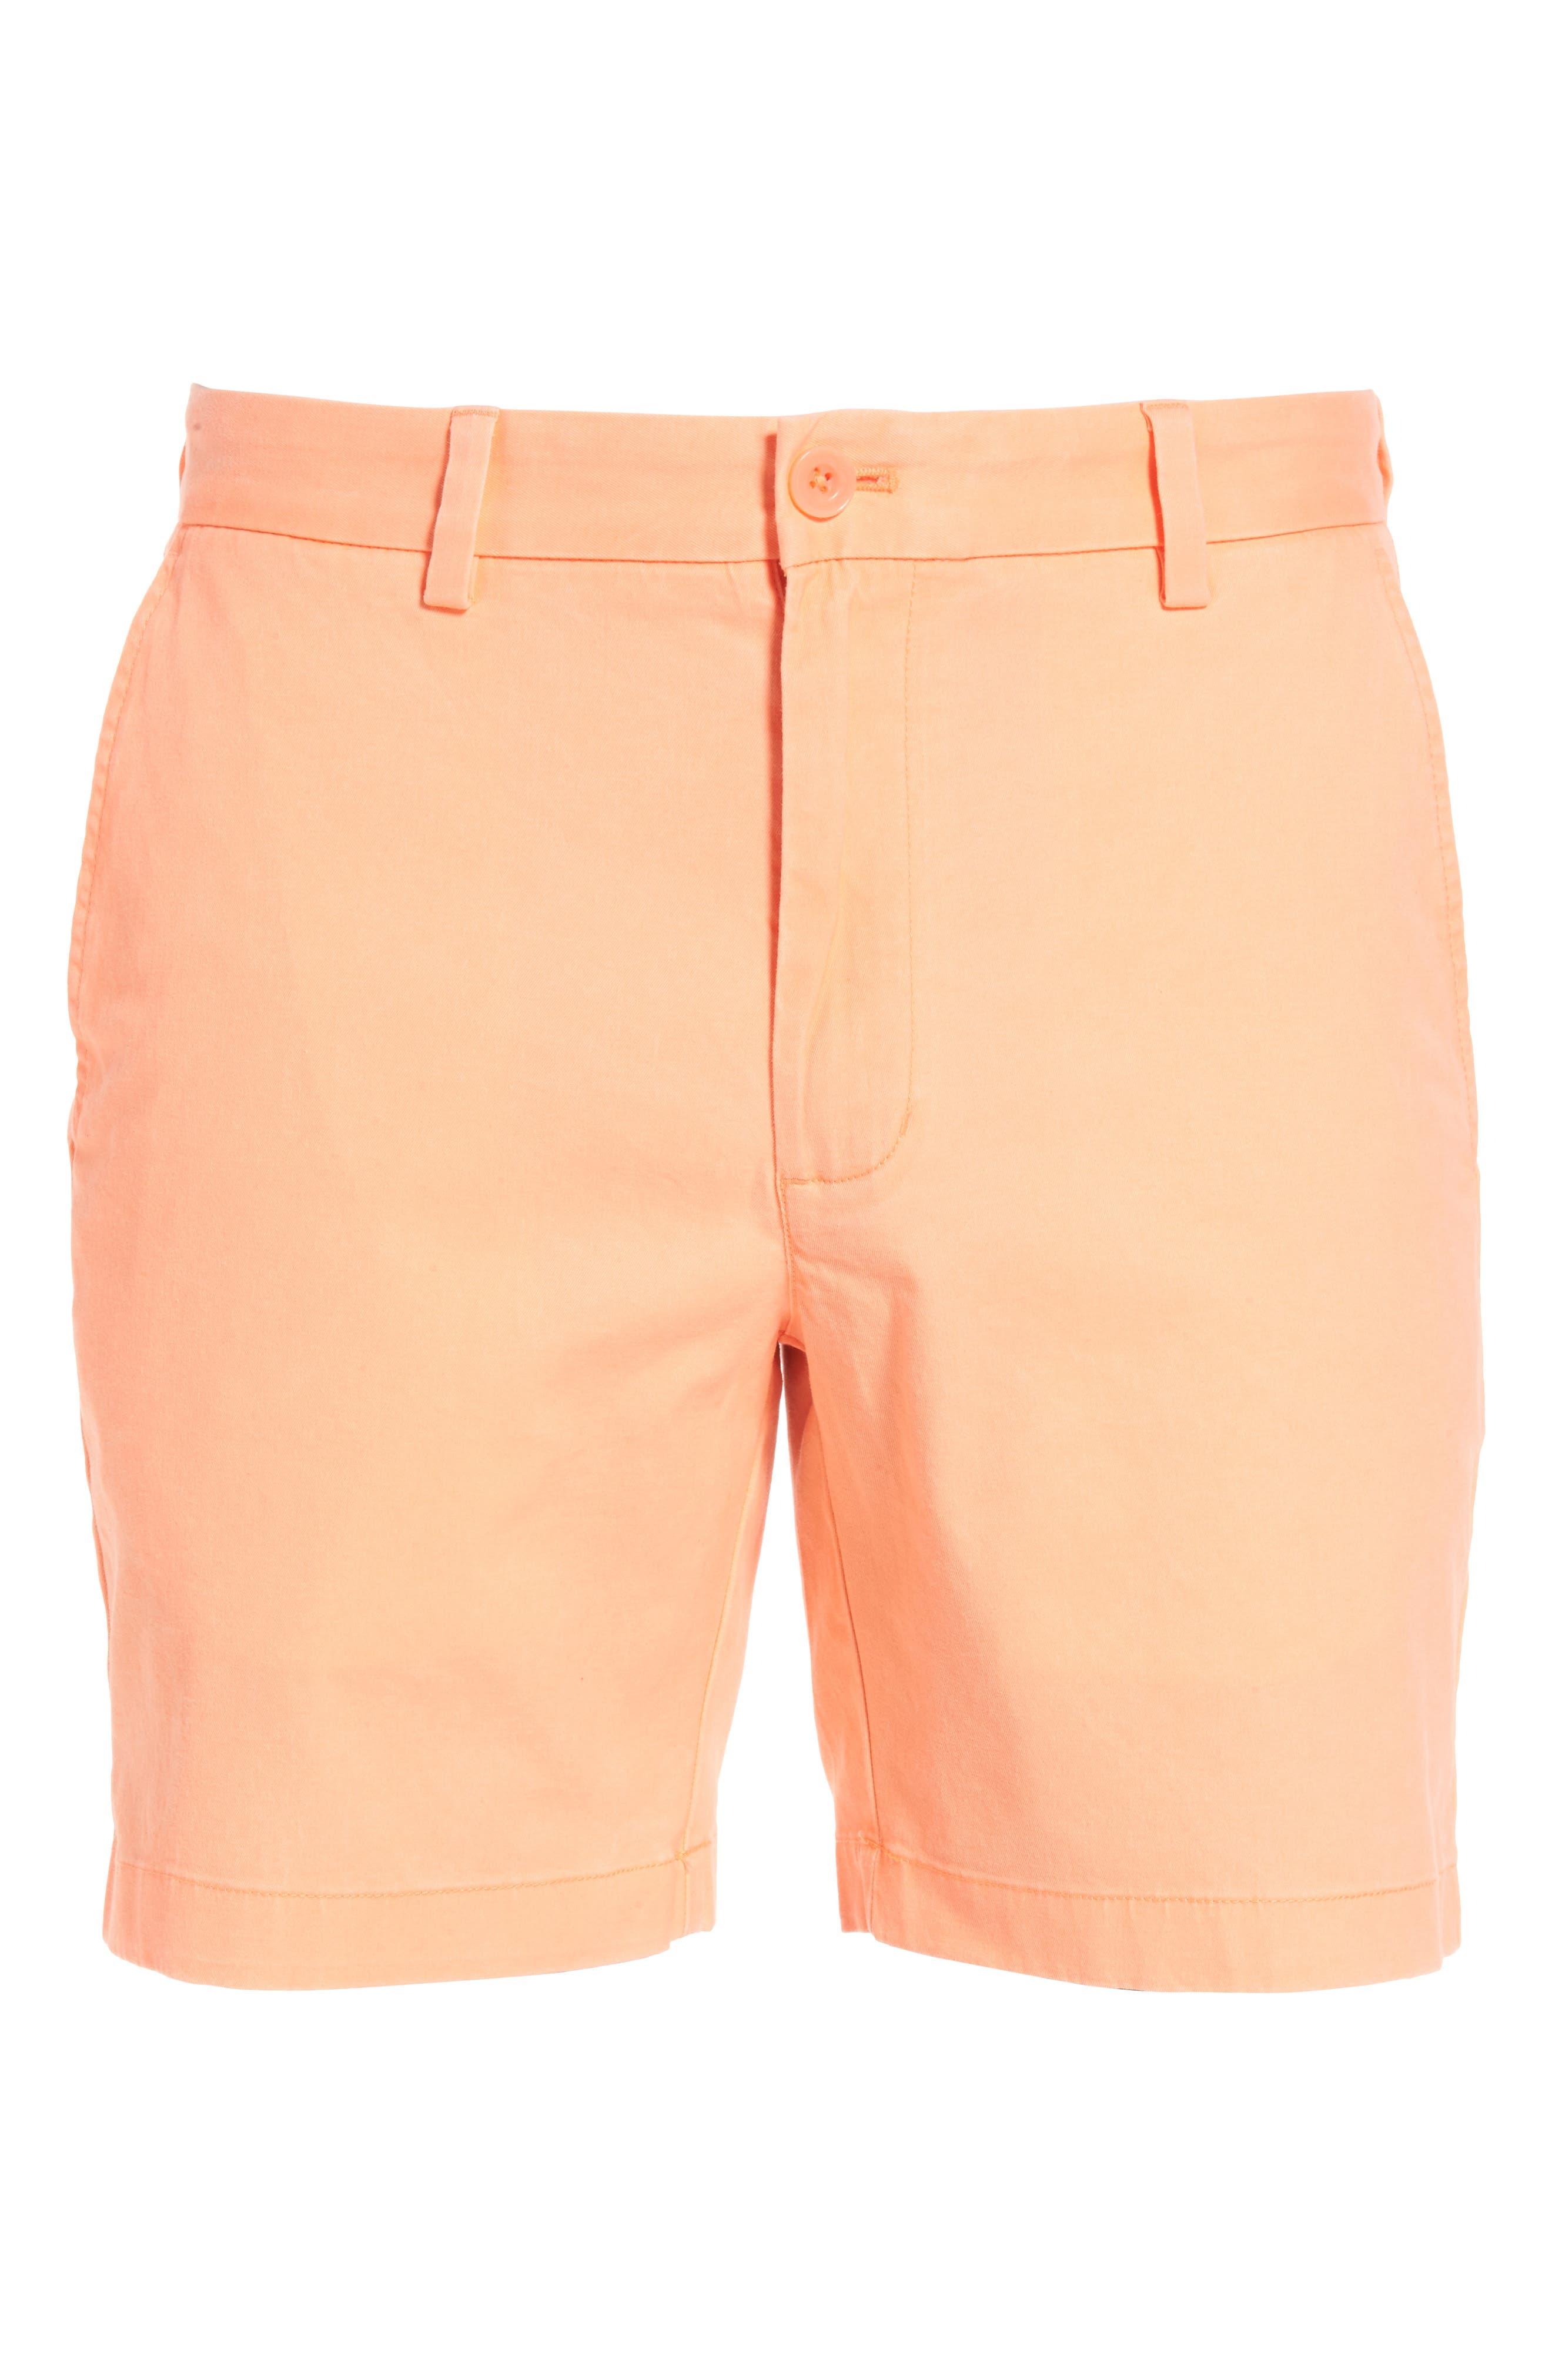 7 Inch Breaker Stretch Shorts,                             Alternate thumbnail 6, color,                             885